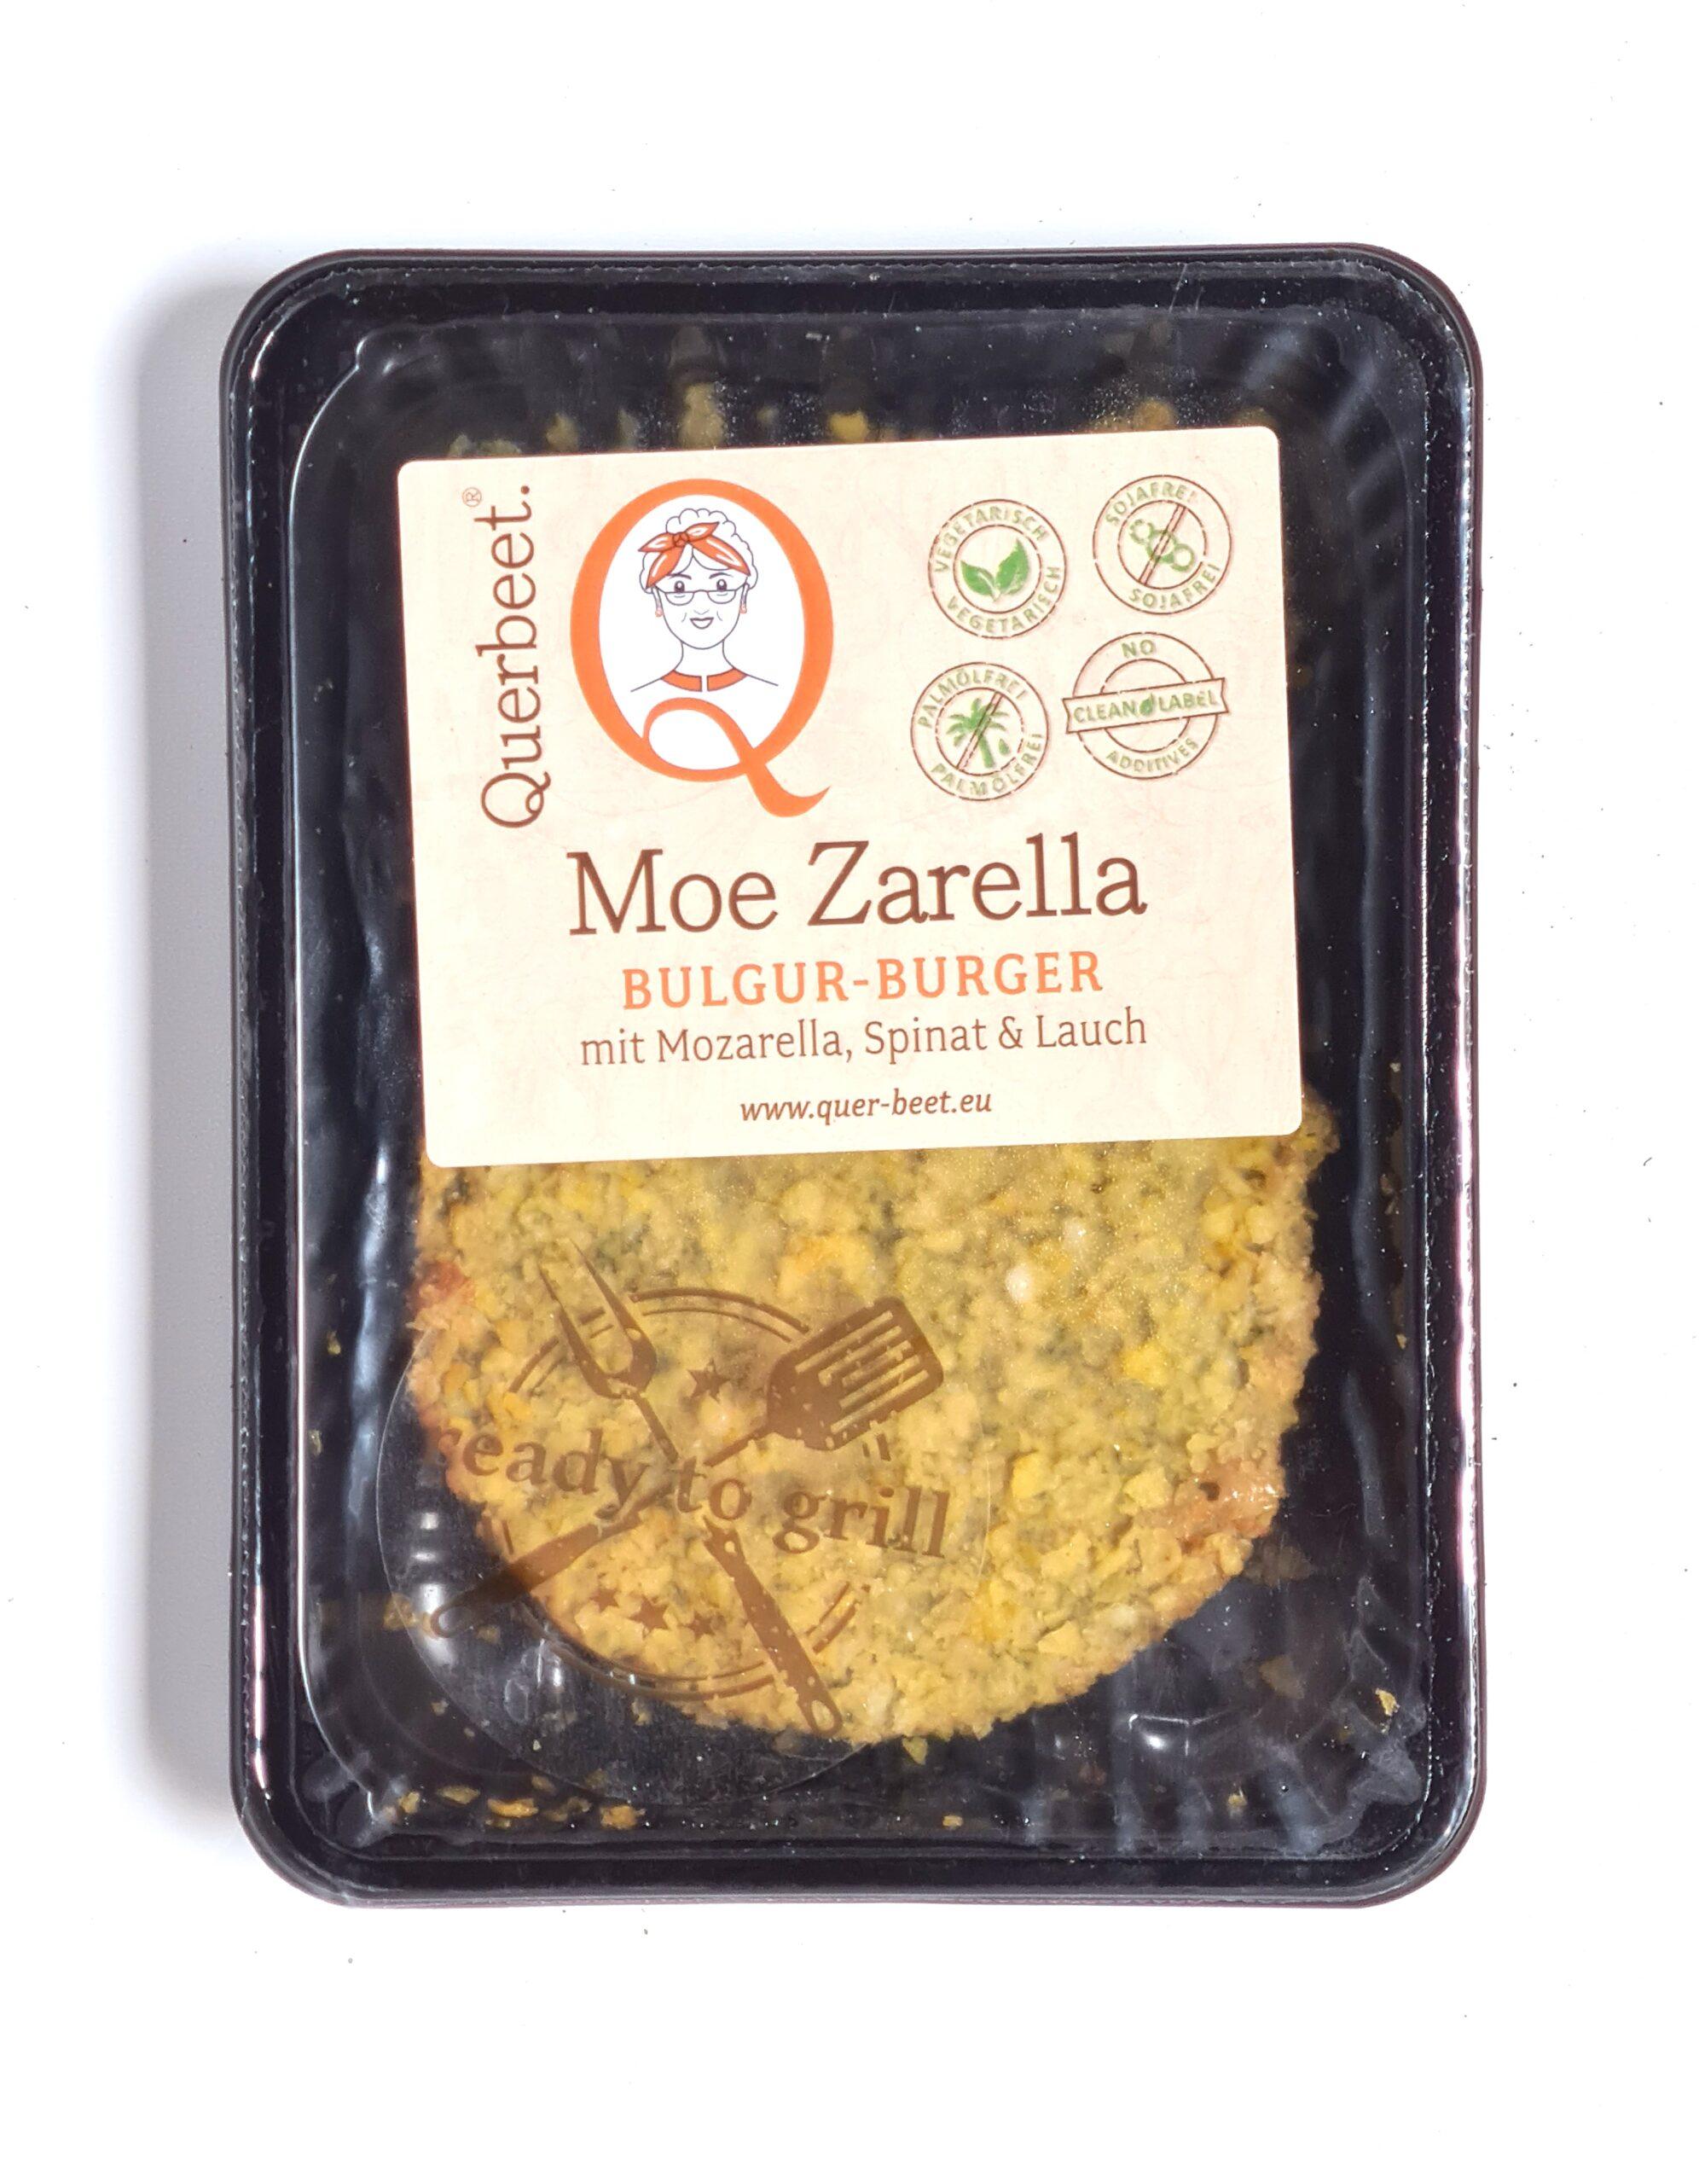 Moe Zarella